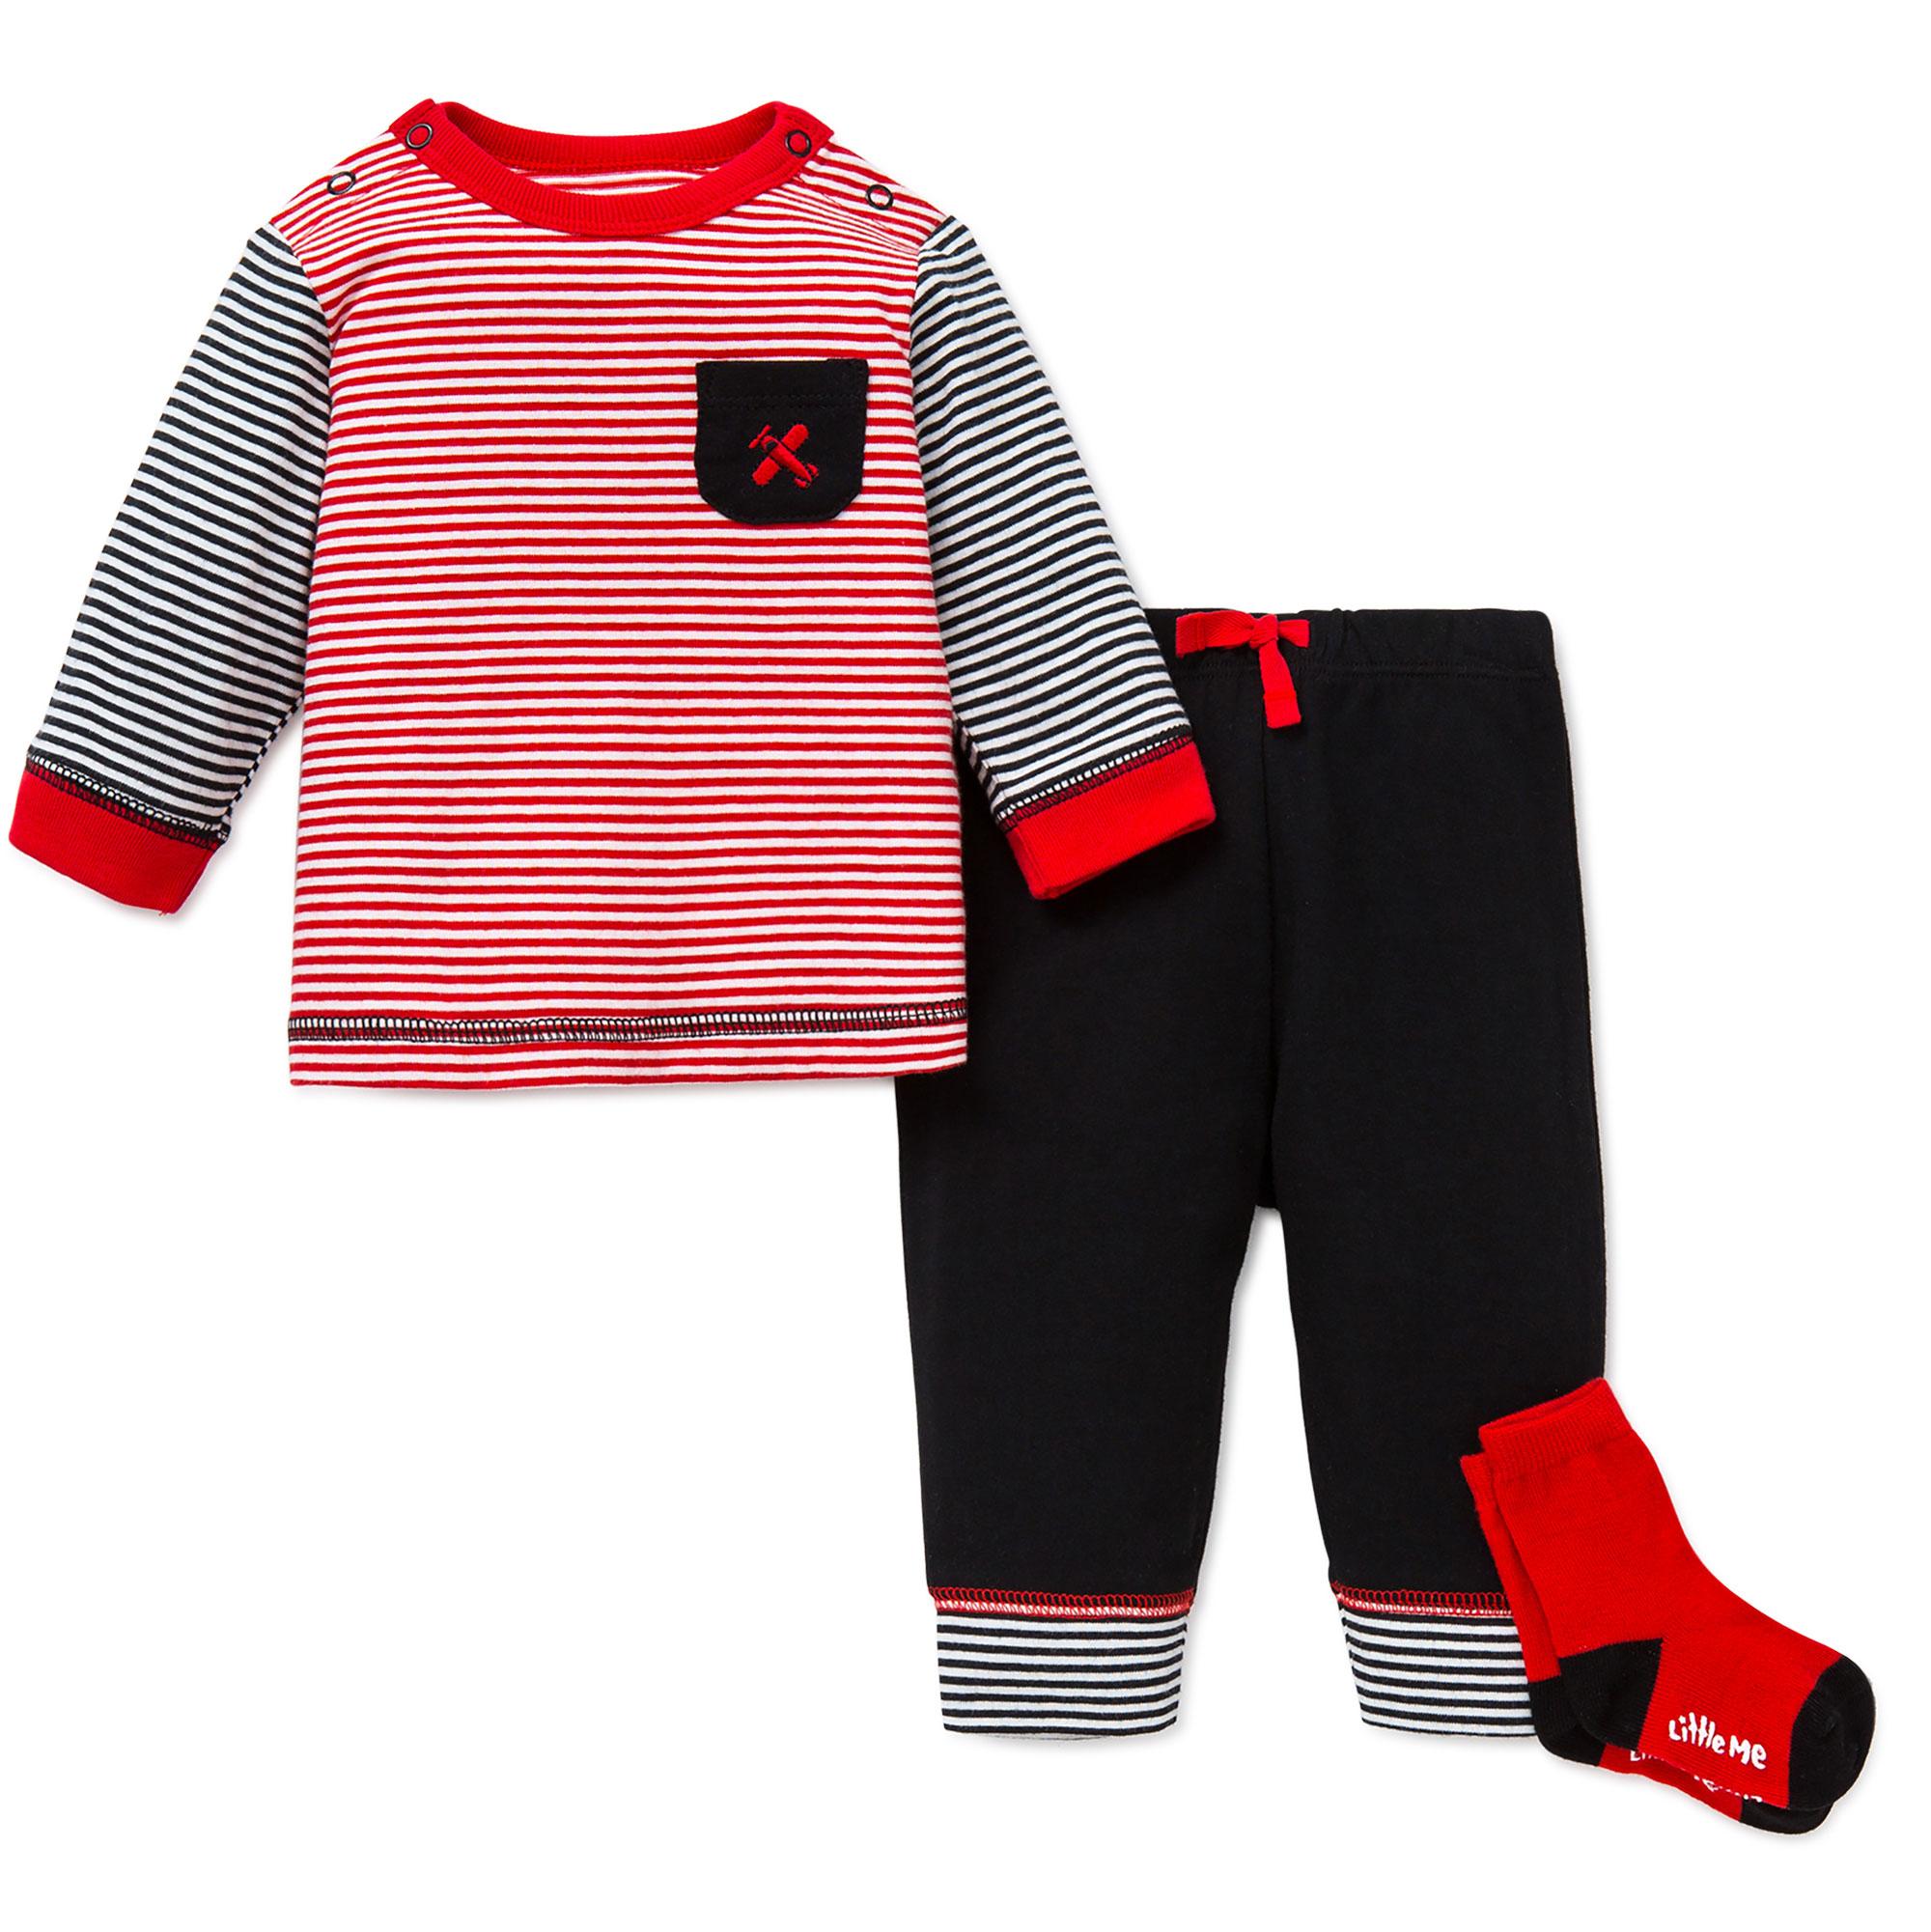 Little Me 3 Piece Pants Long Sleeve Shirt and Socks